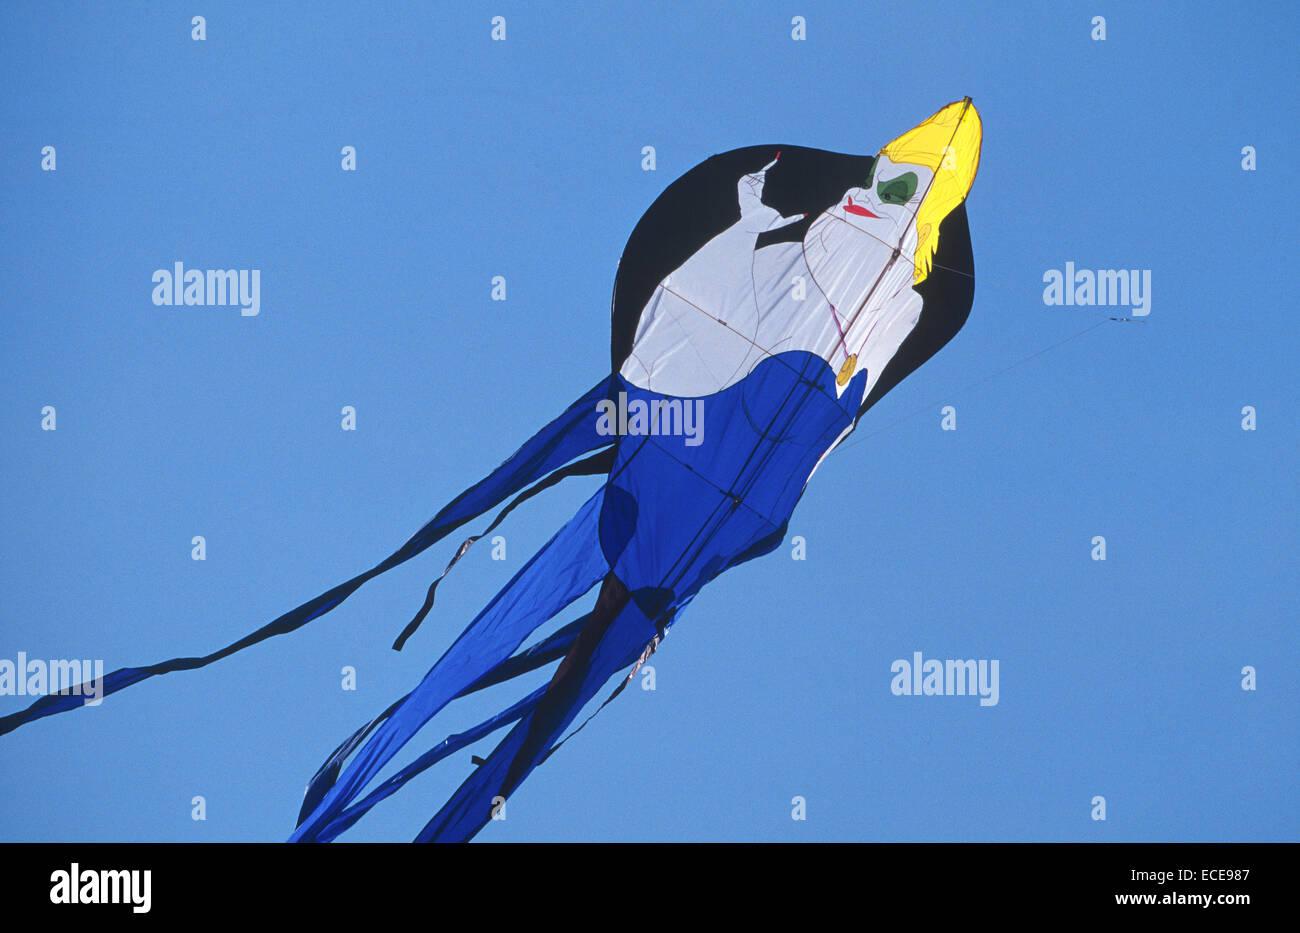 europe, italy, umbria, castiglione del lago, international kites meeting, woman-shaped kite - Stock Image